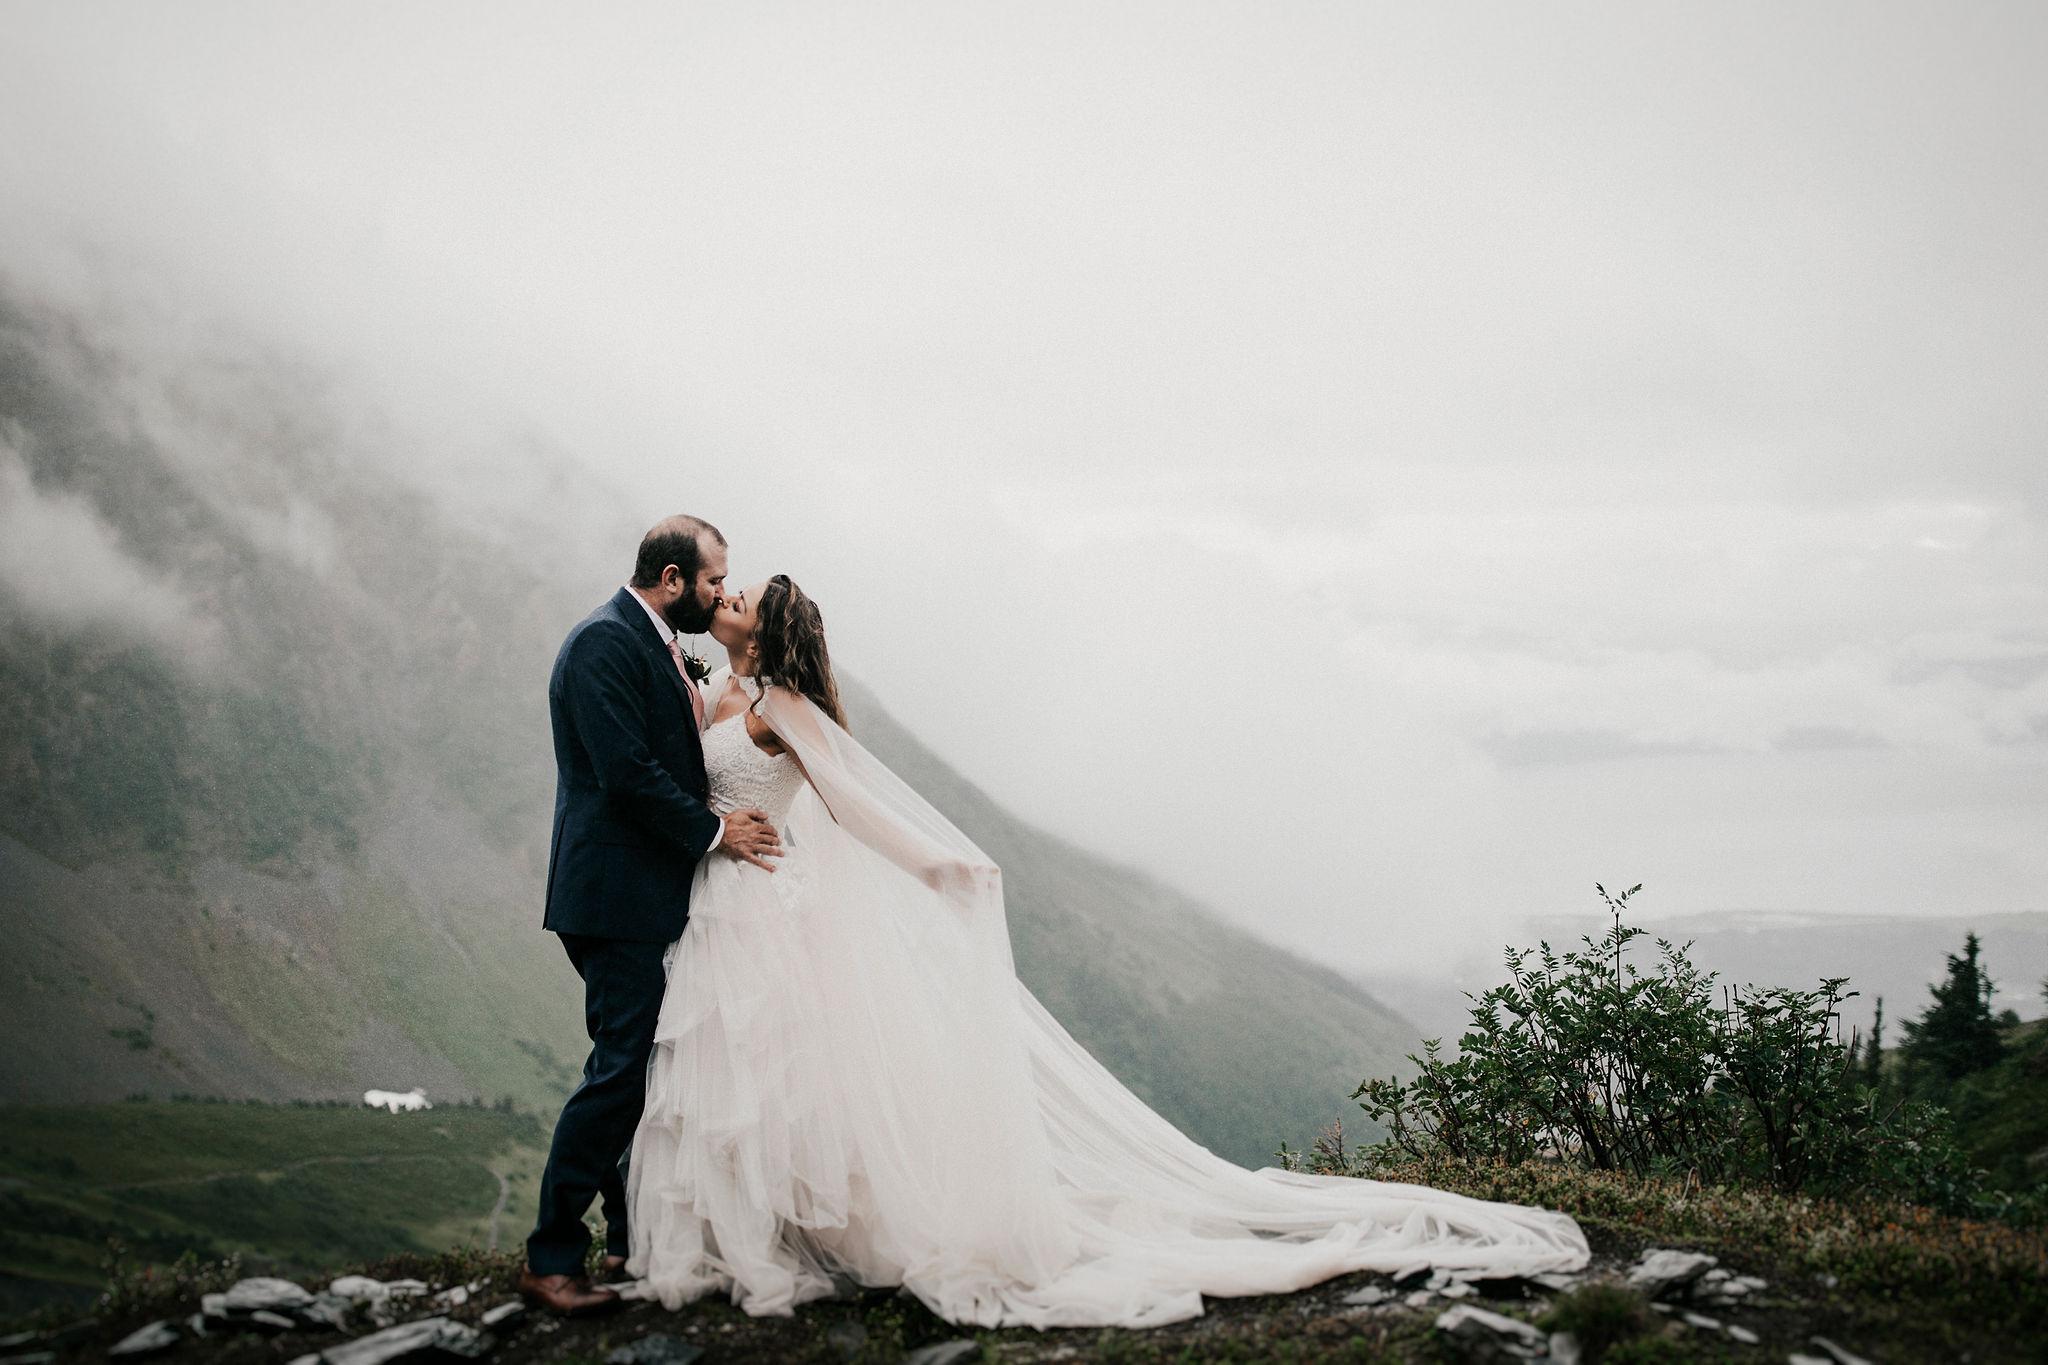 Elope to Alaska - Alaska Elopement Packages - Alaska Destination Weddings